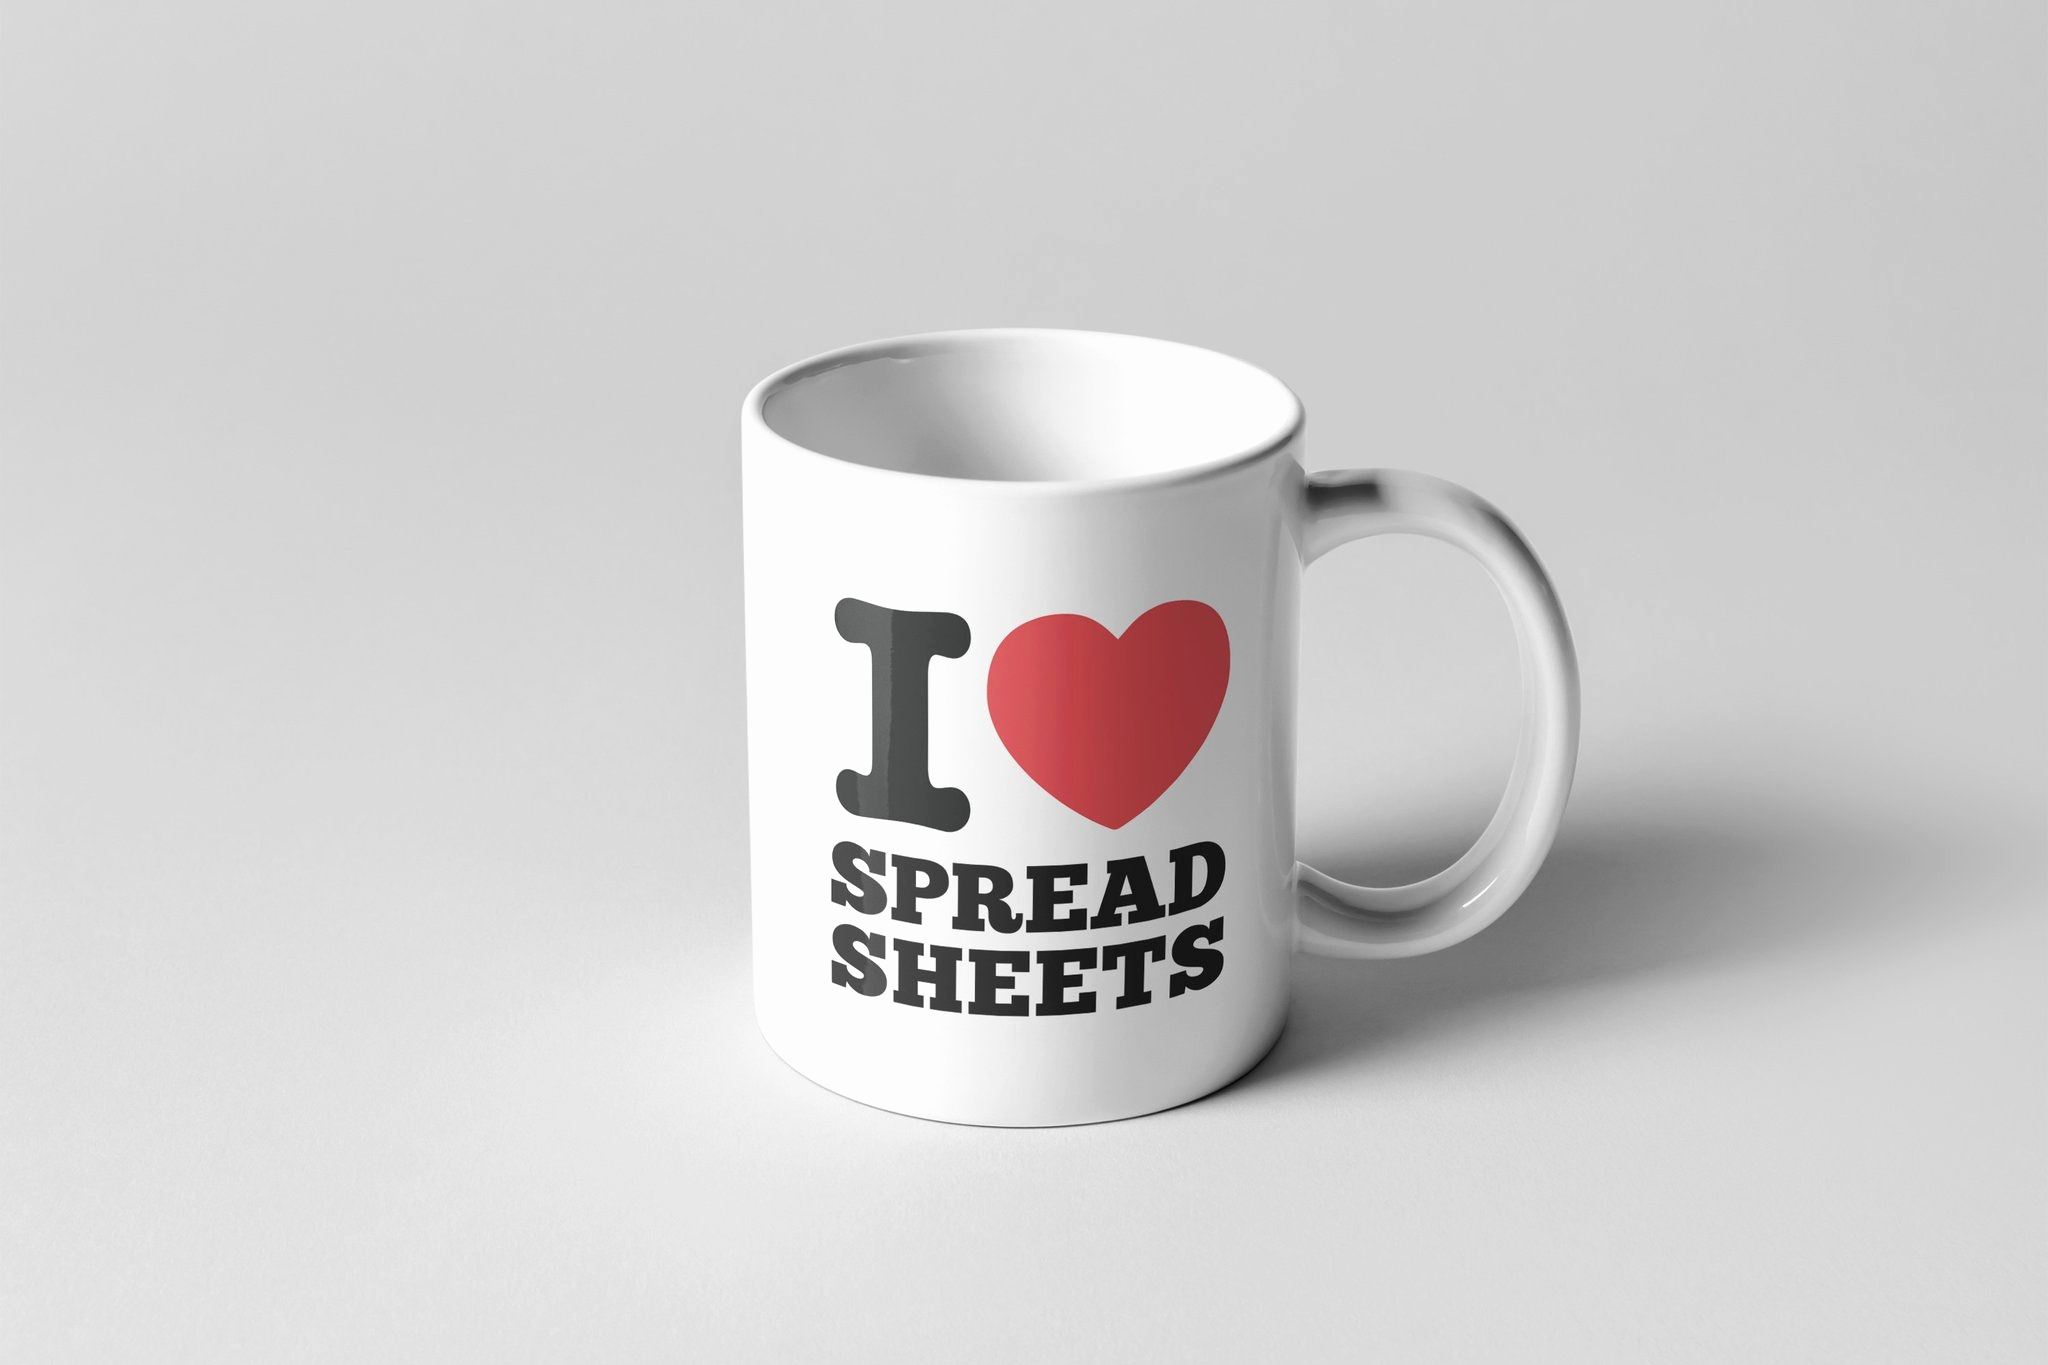 I Heart Spreadsheets Mug Best Of 50 Inspirational I Heart Inside I Heart Spreadsheets Mug